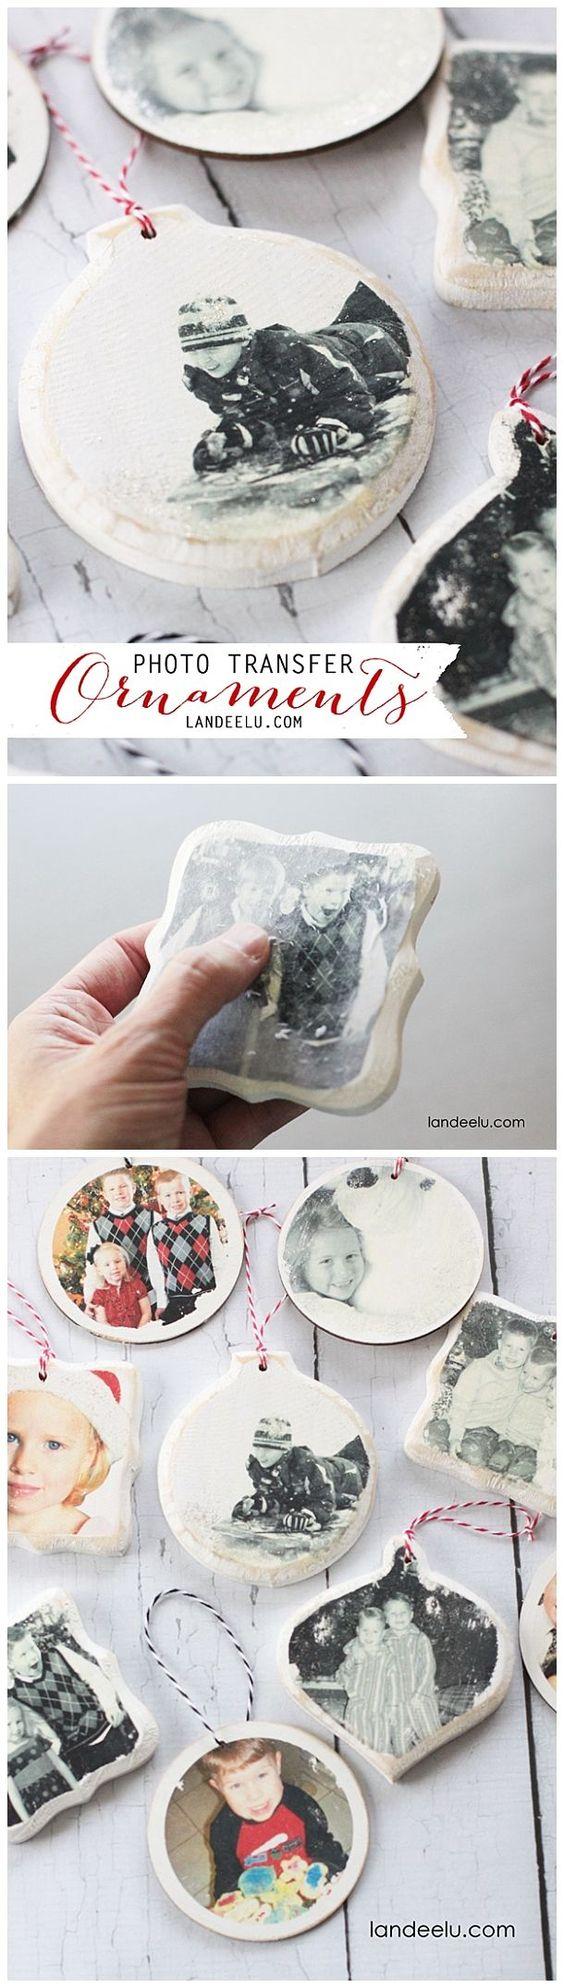 DIY Photo Transfer Christmas Ornaments Tutorial | Landeelu - Easy and Cheap DIY Christmas Tree Ornaments